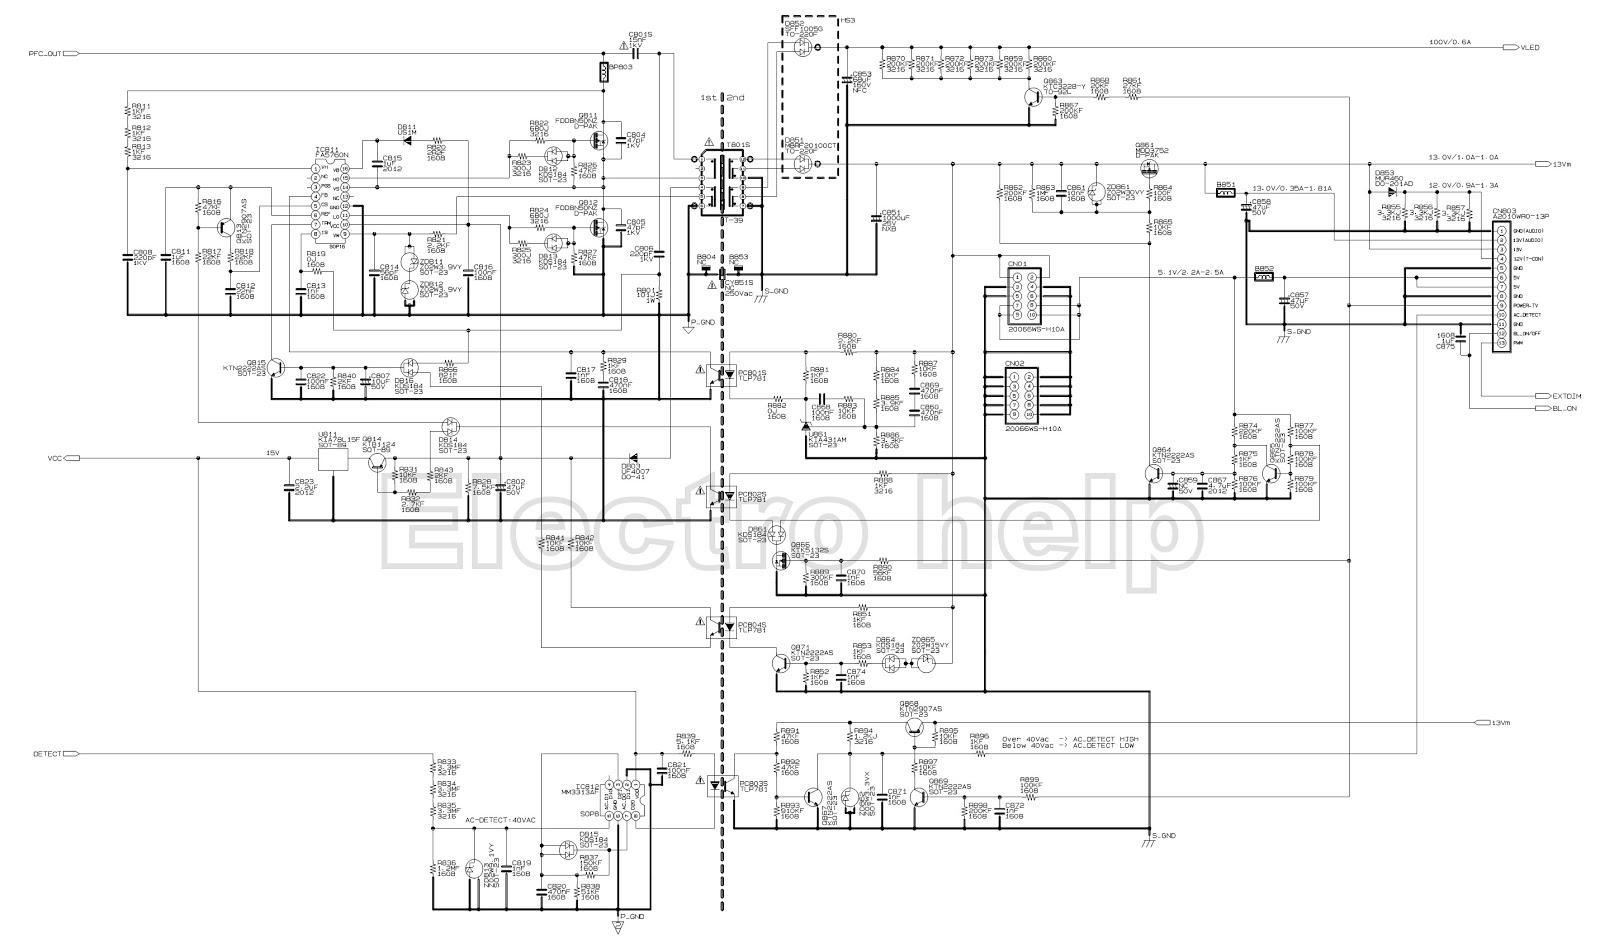 toshiba 32l2300 toshiba 39l2300 led lcd tv smps. Black Bedroom Furniture Sets. Home Design Ideas